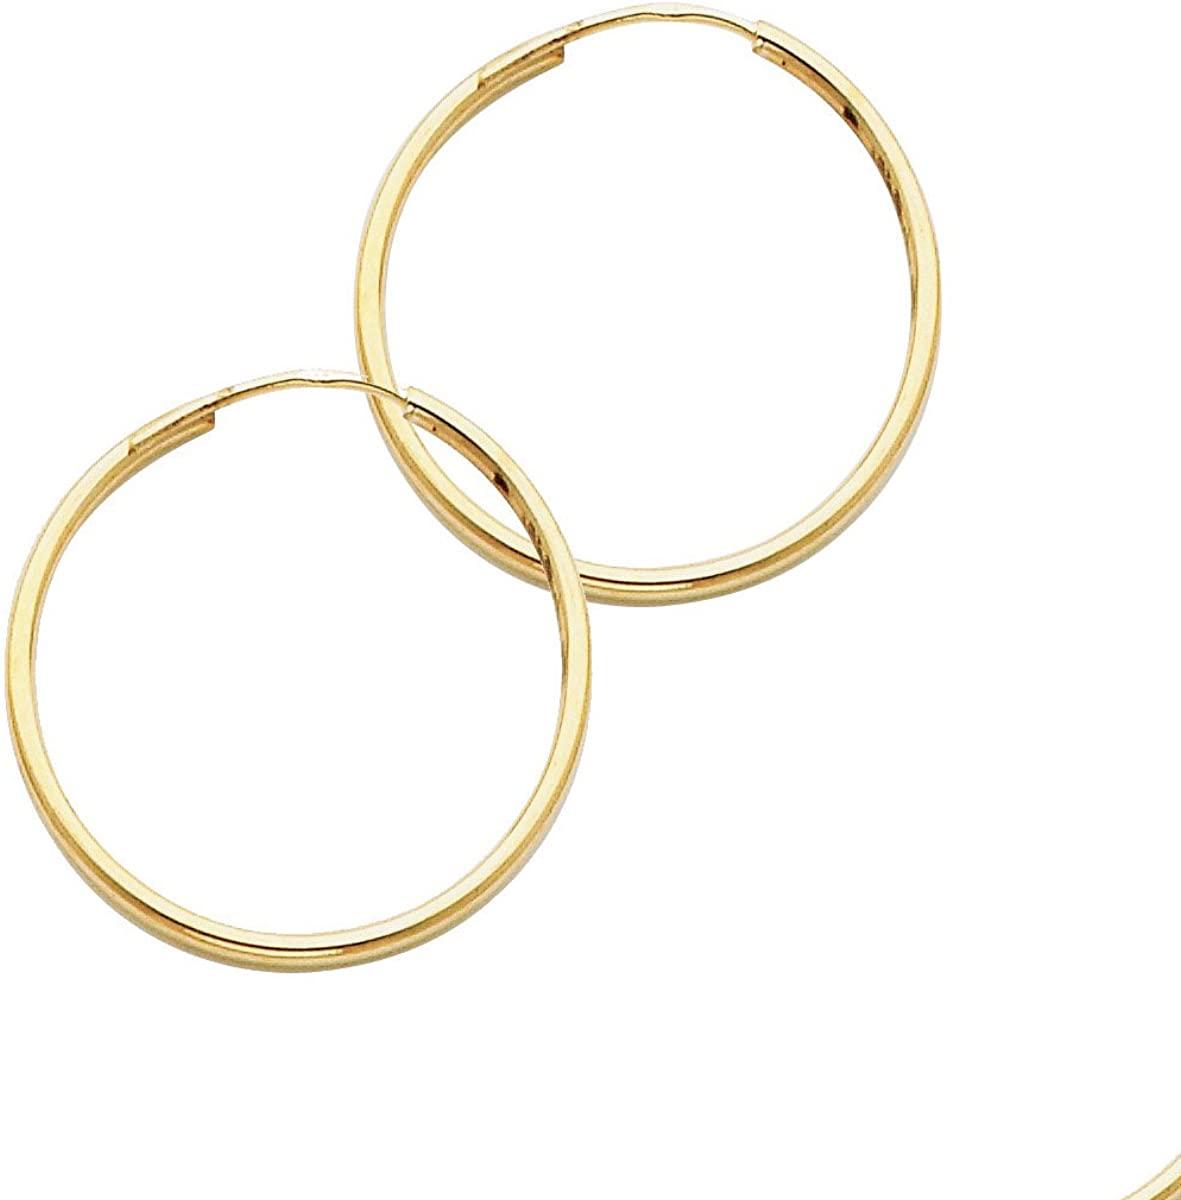 14K Yellow Gold 1.5mm Thickness Hoop Endless Earrings/Diameter 25 MM